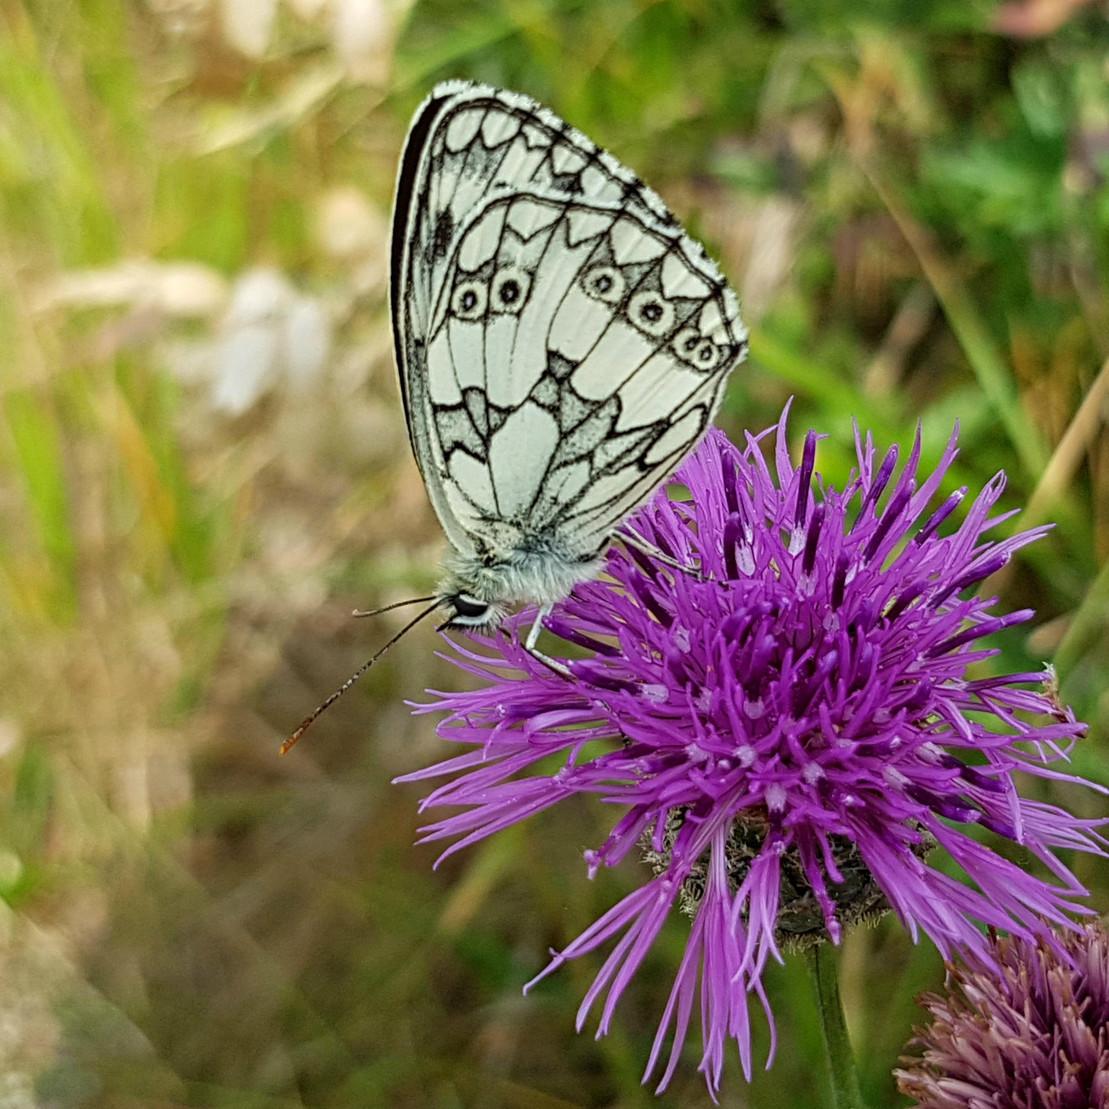 Bedrohte Schmetterlingsart: Schachbrettfalter